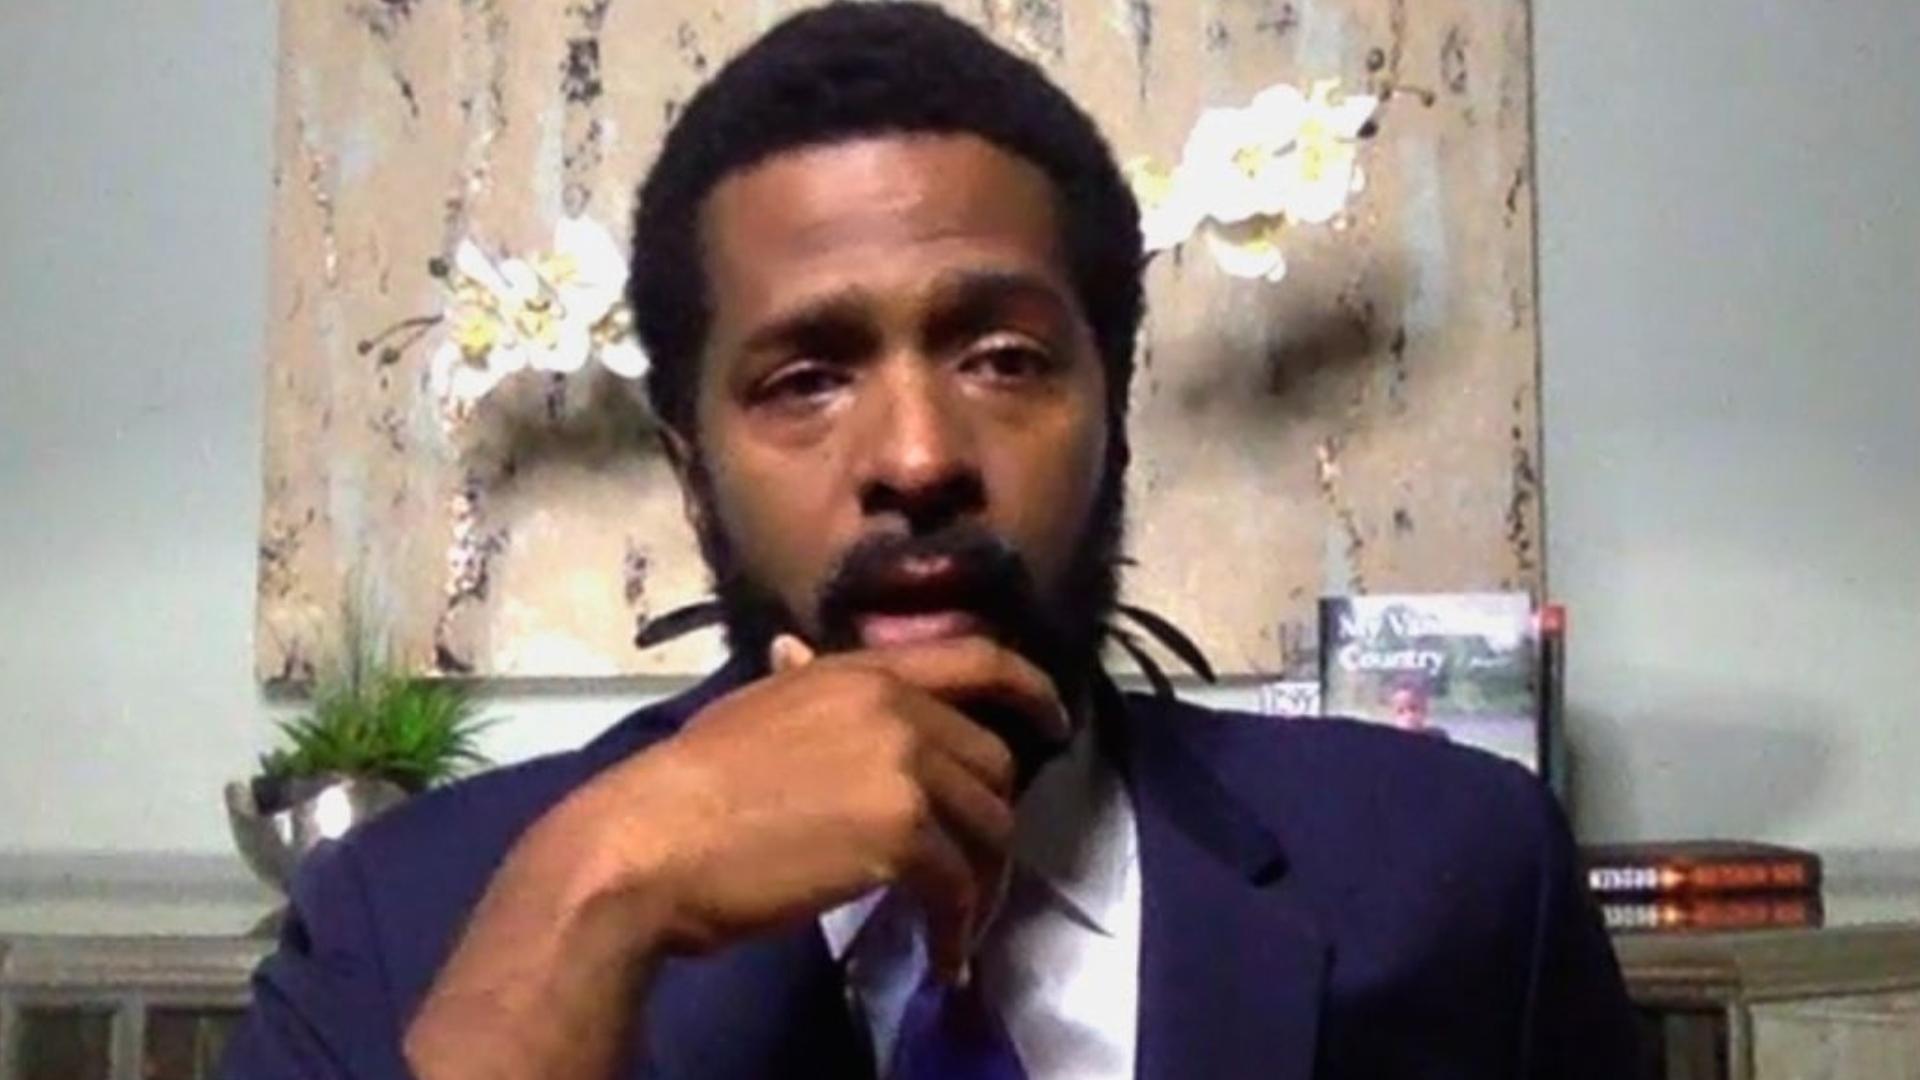 Bakari Sellers cries over George Floyd murder: 'It's hard being Black in this country'